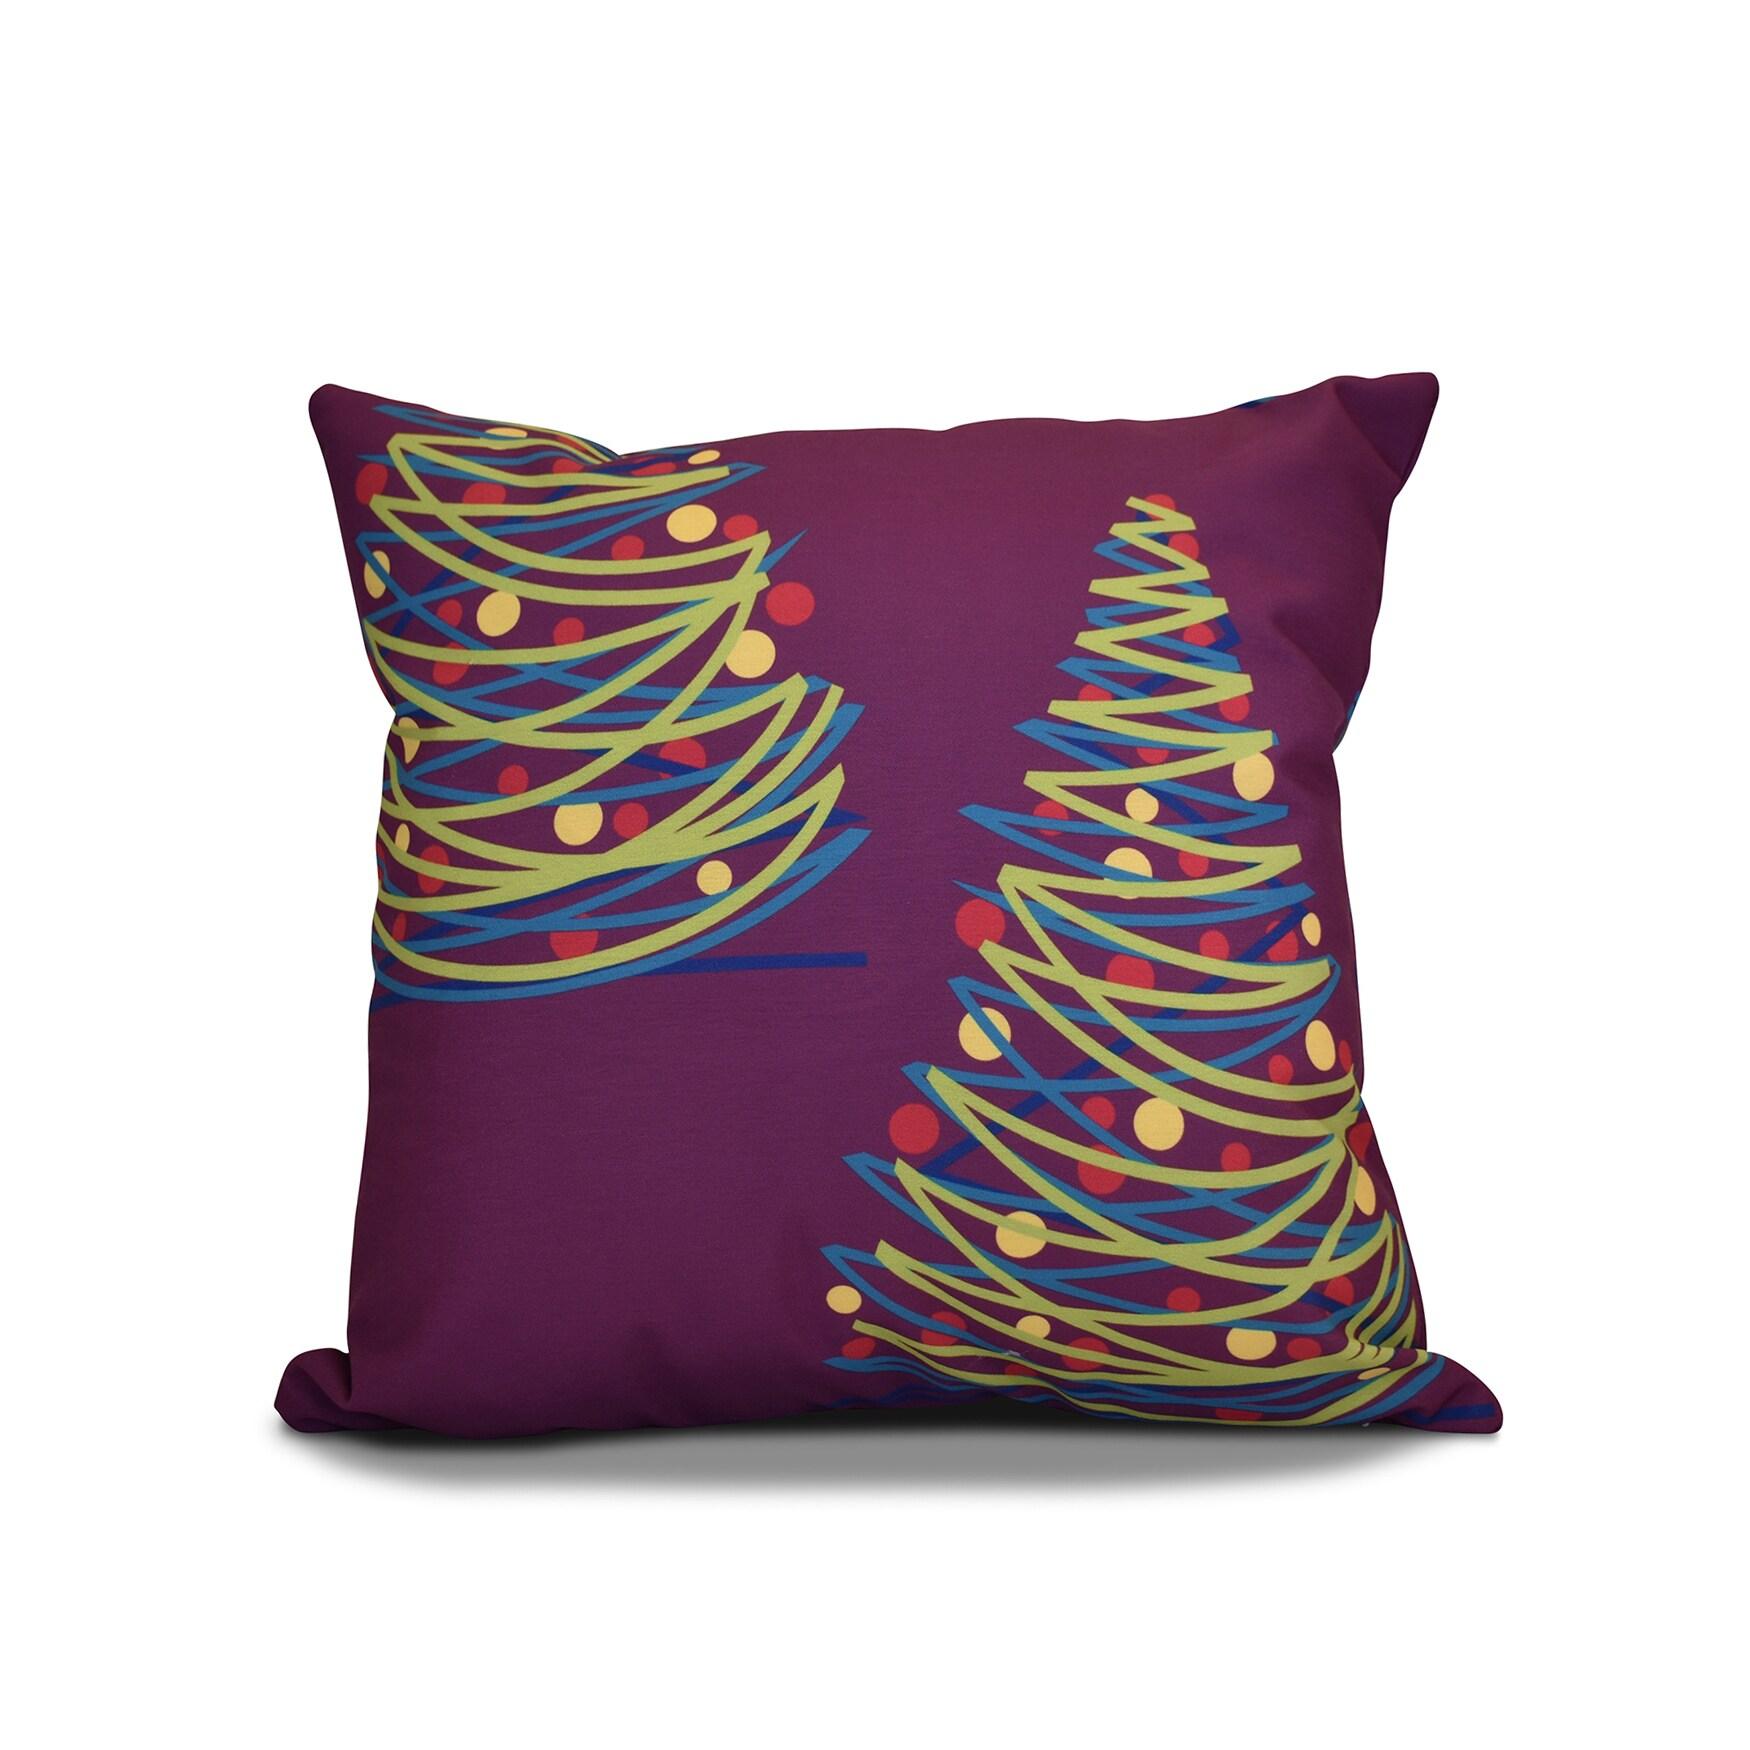 Tannenbaum Outdoor.16 X 16 Inch O Tannenbaum Geometric Holiday Print Outdoor Pillow